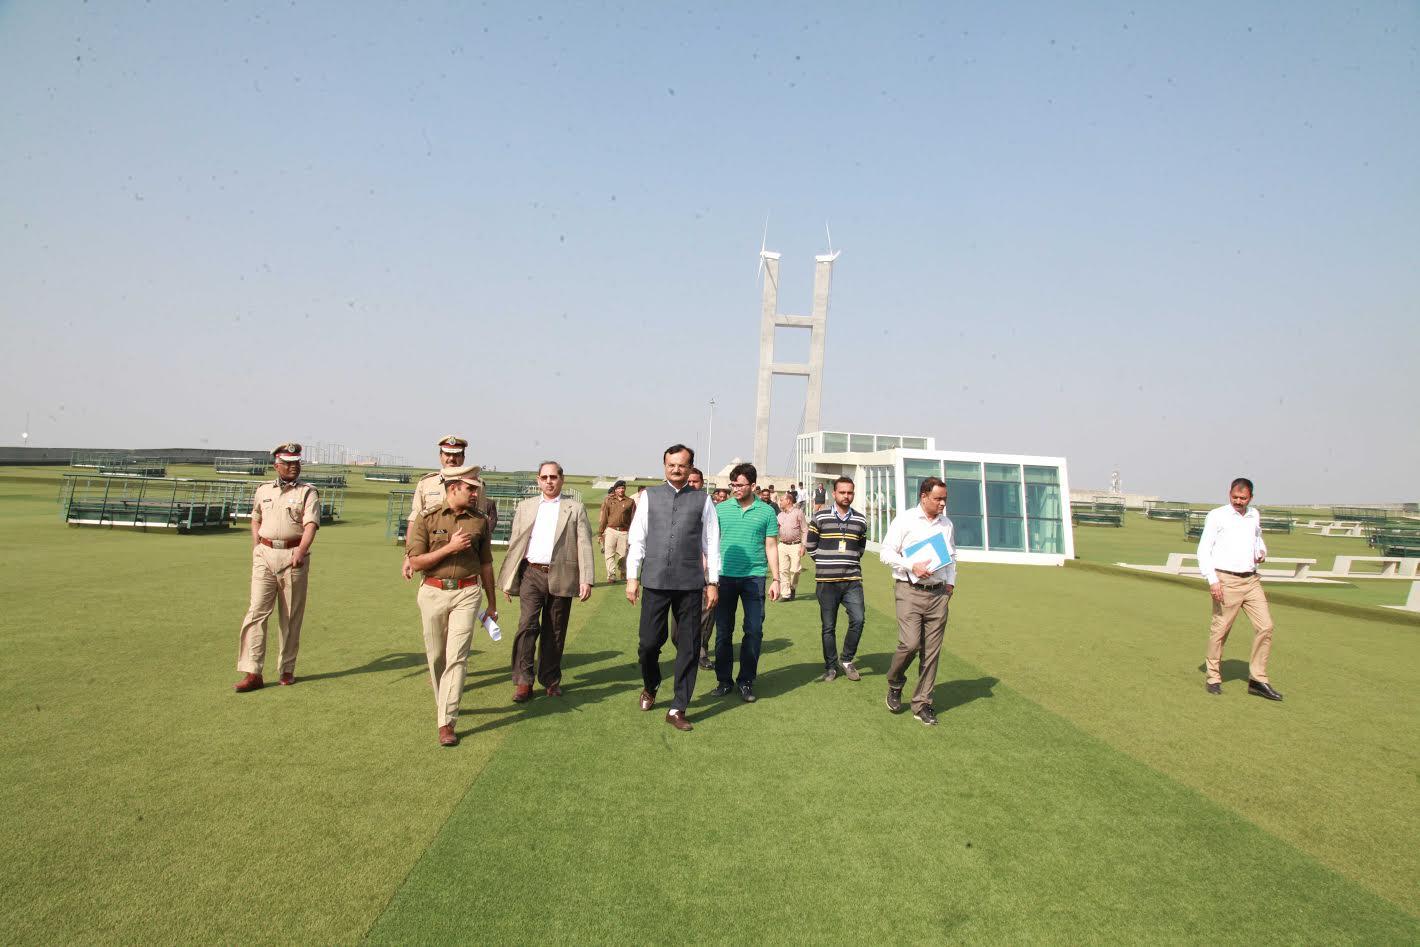 3825 cops on Vibrant Summit duty; MoS Home reviews security arrangements